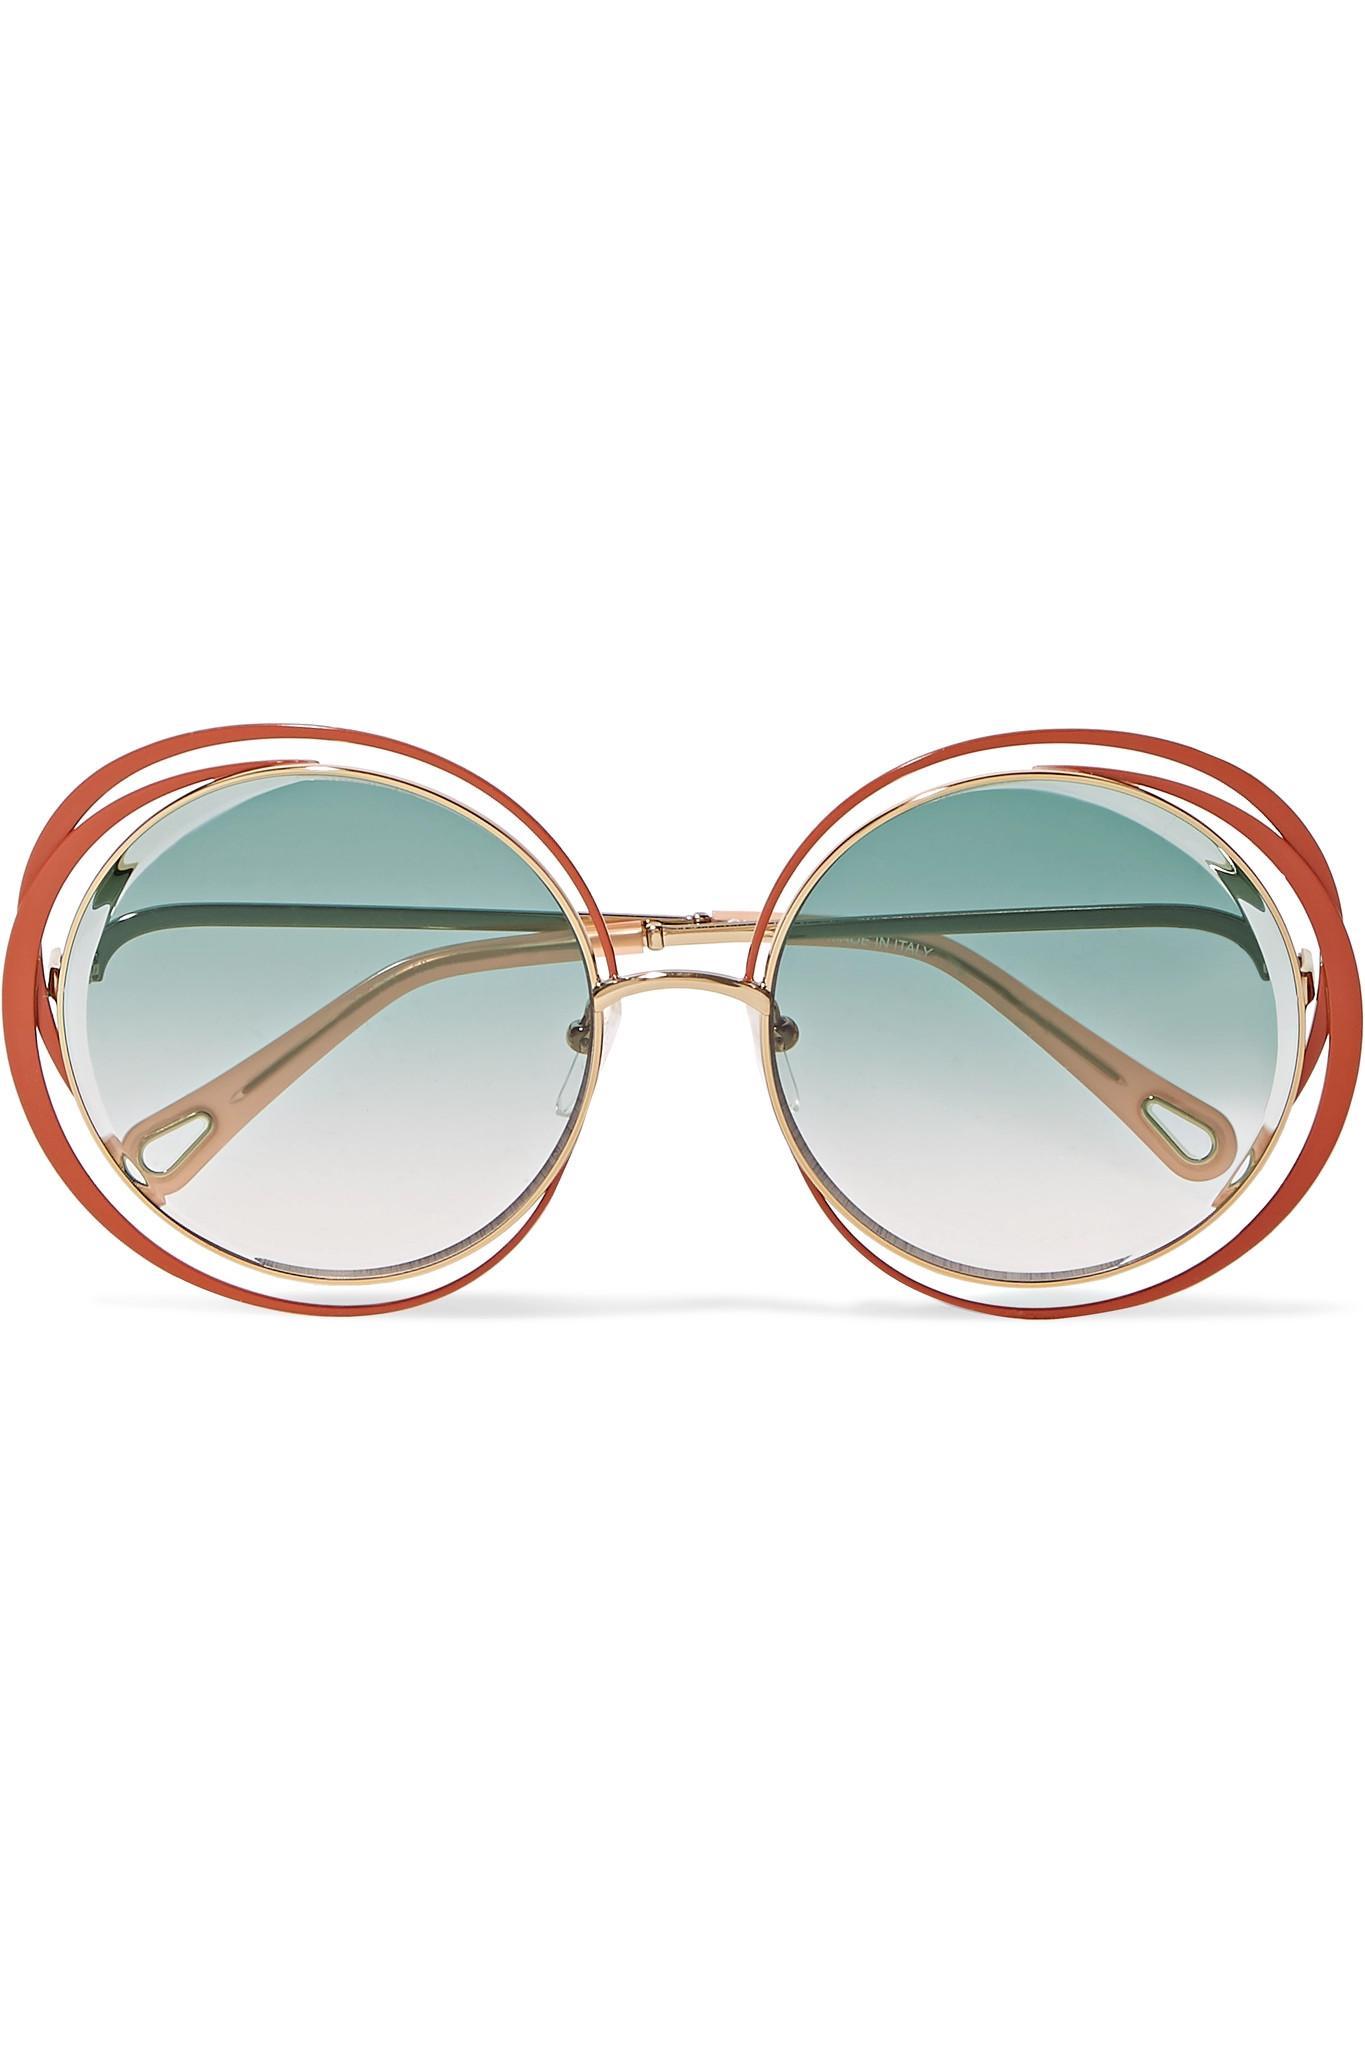 2f96916d01e8 Lyst - Chloé Carlina Oversized Round-frame Gold-tone Sunglasses in Blue